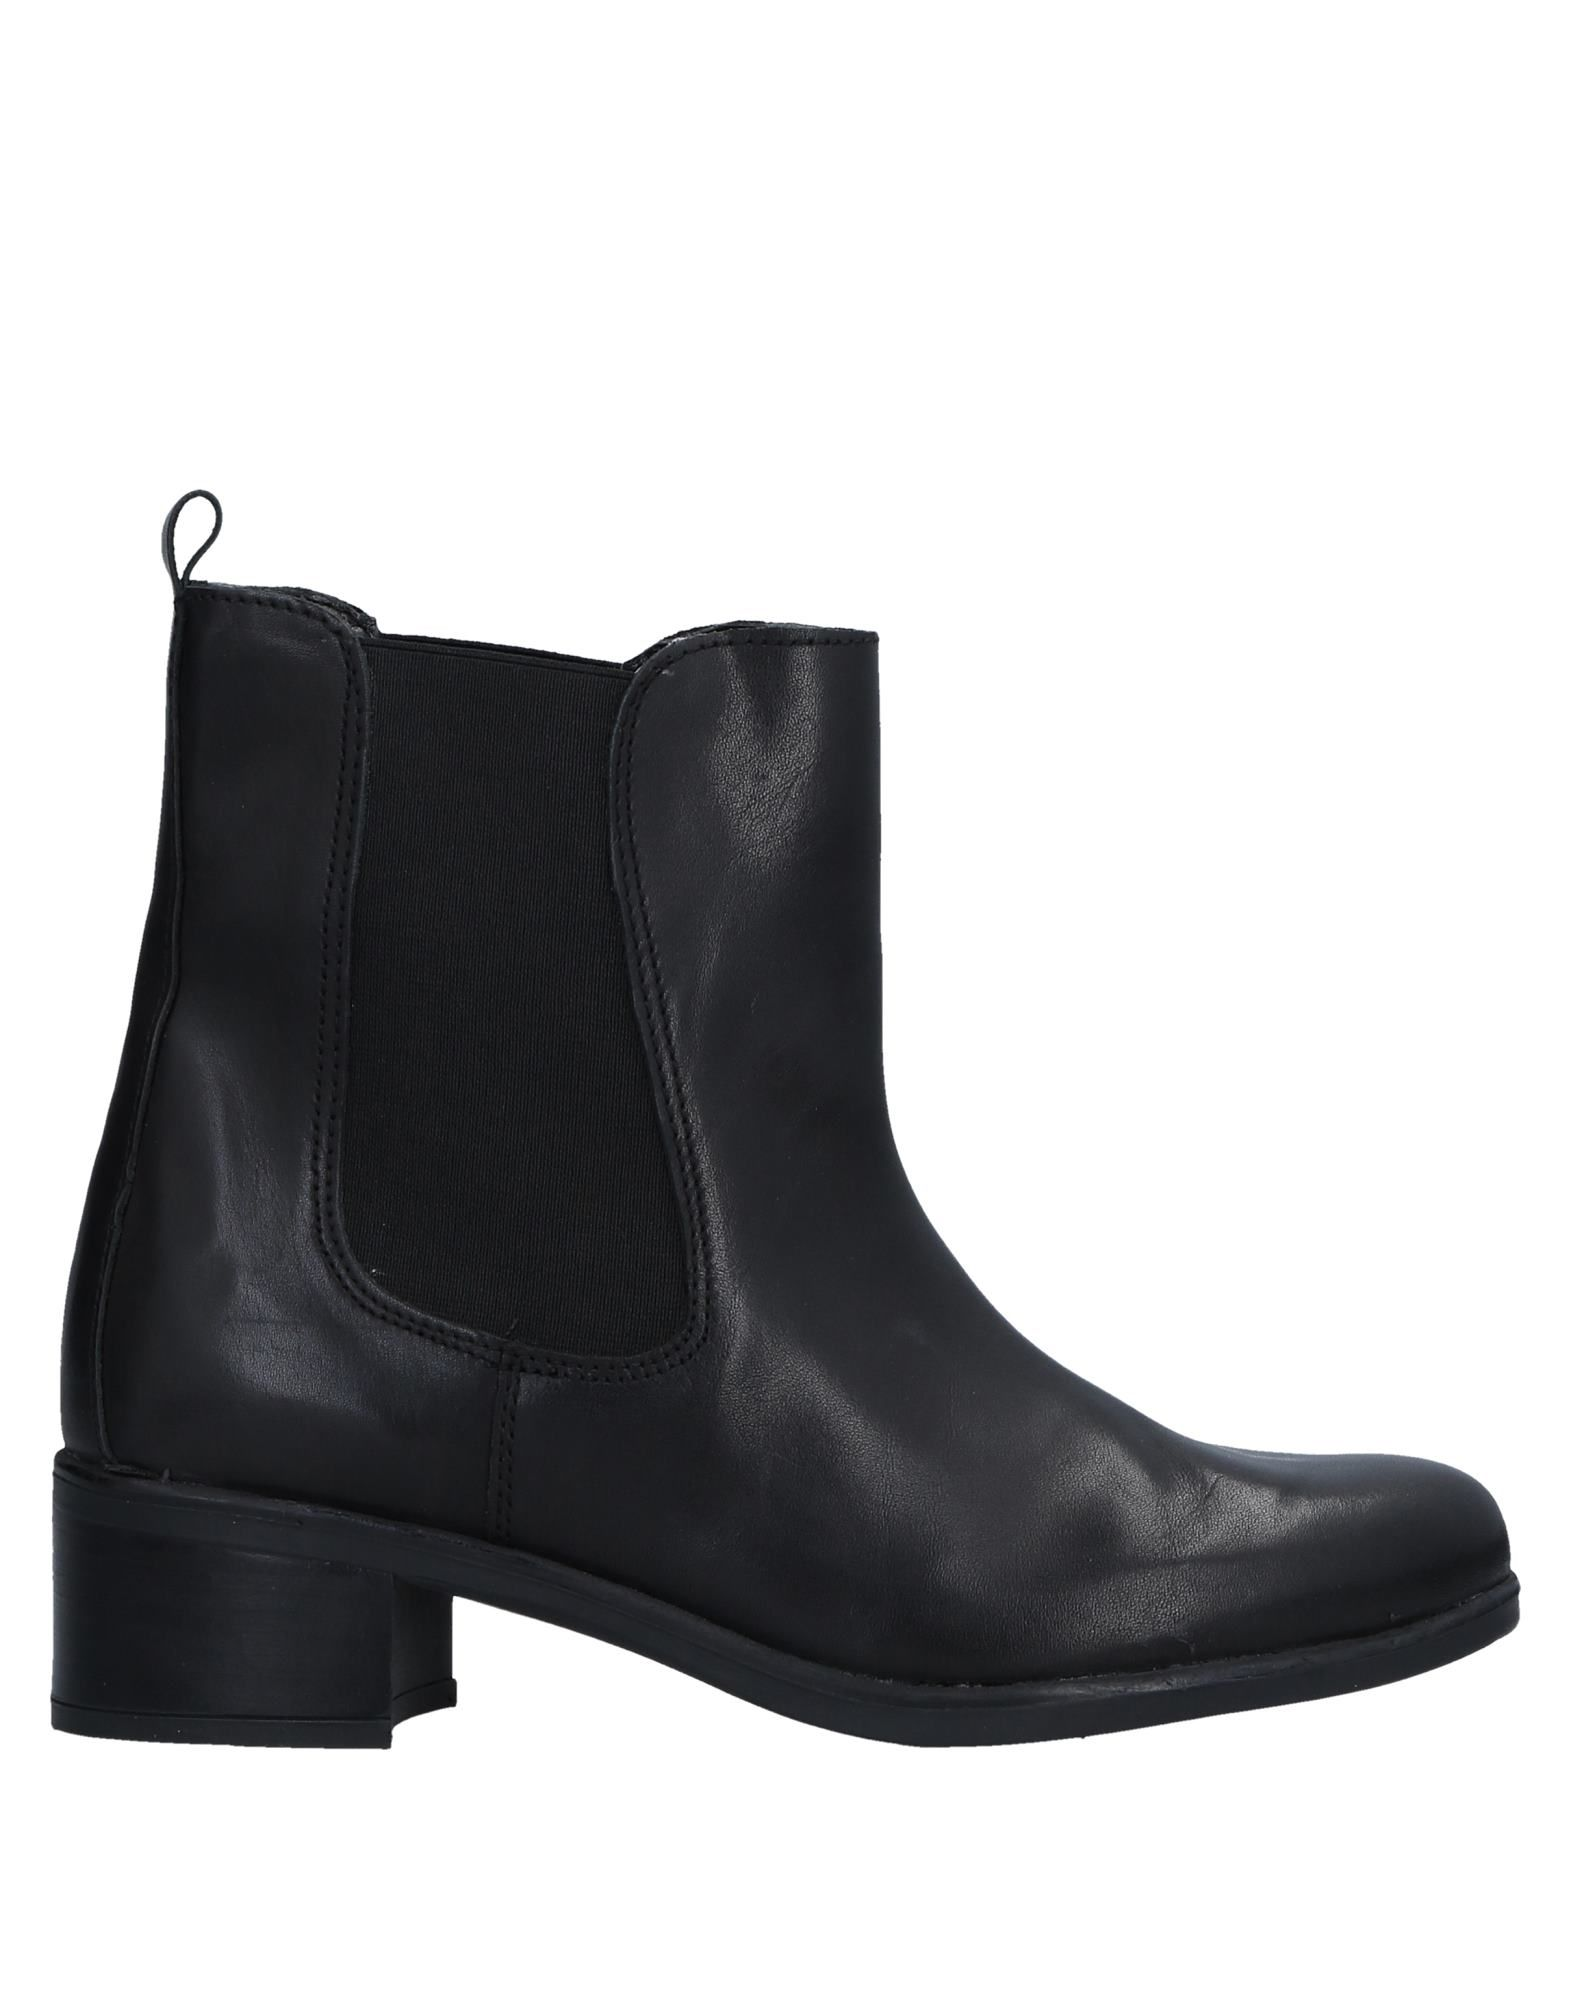 Roberto Della Croce Chelsea Boots Damen  11531255PM Gute Qualität beliebte Schuhe